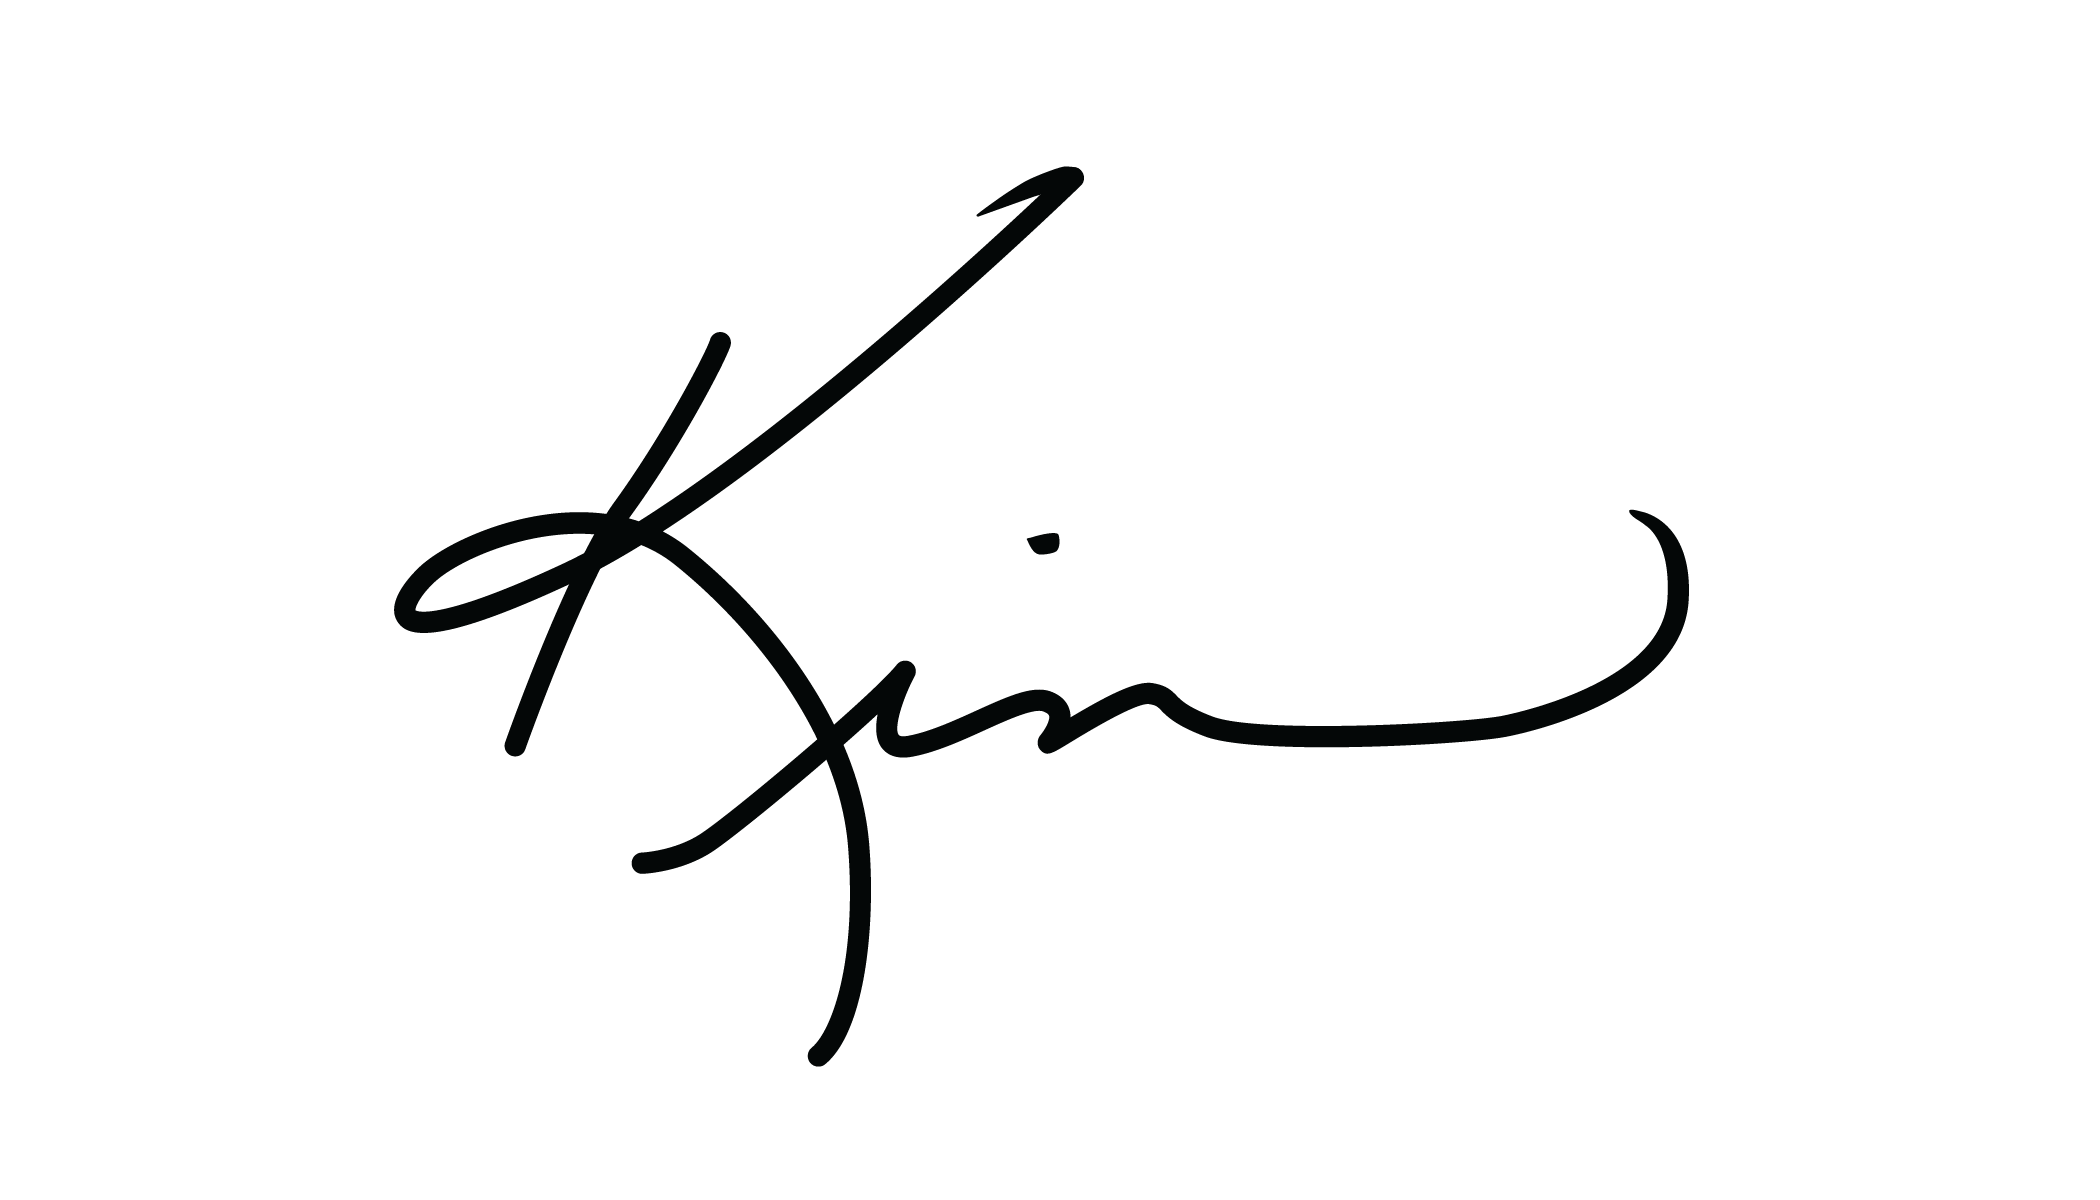 KimBrundage_signature_black.png